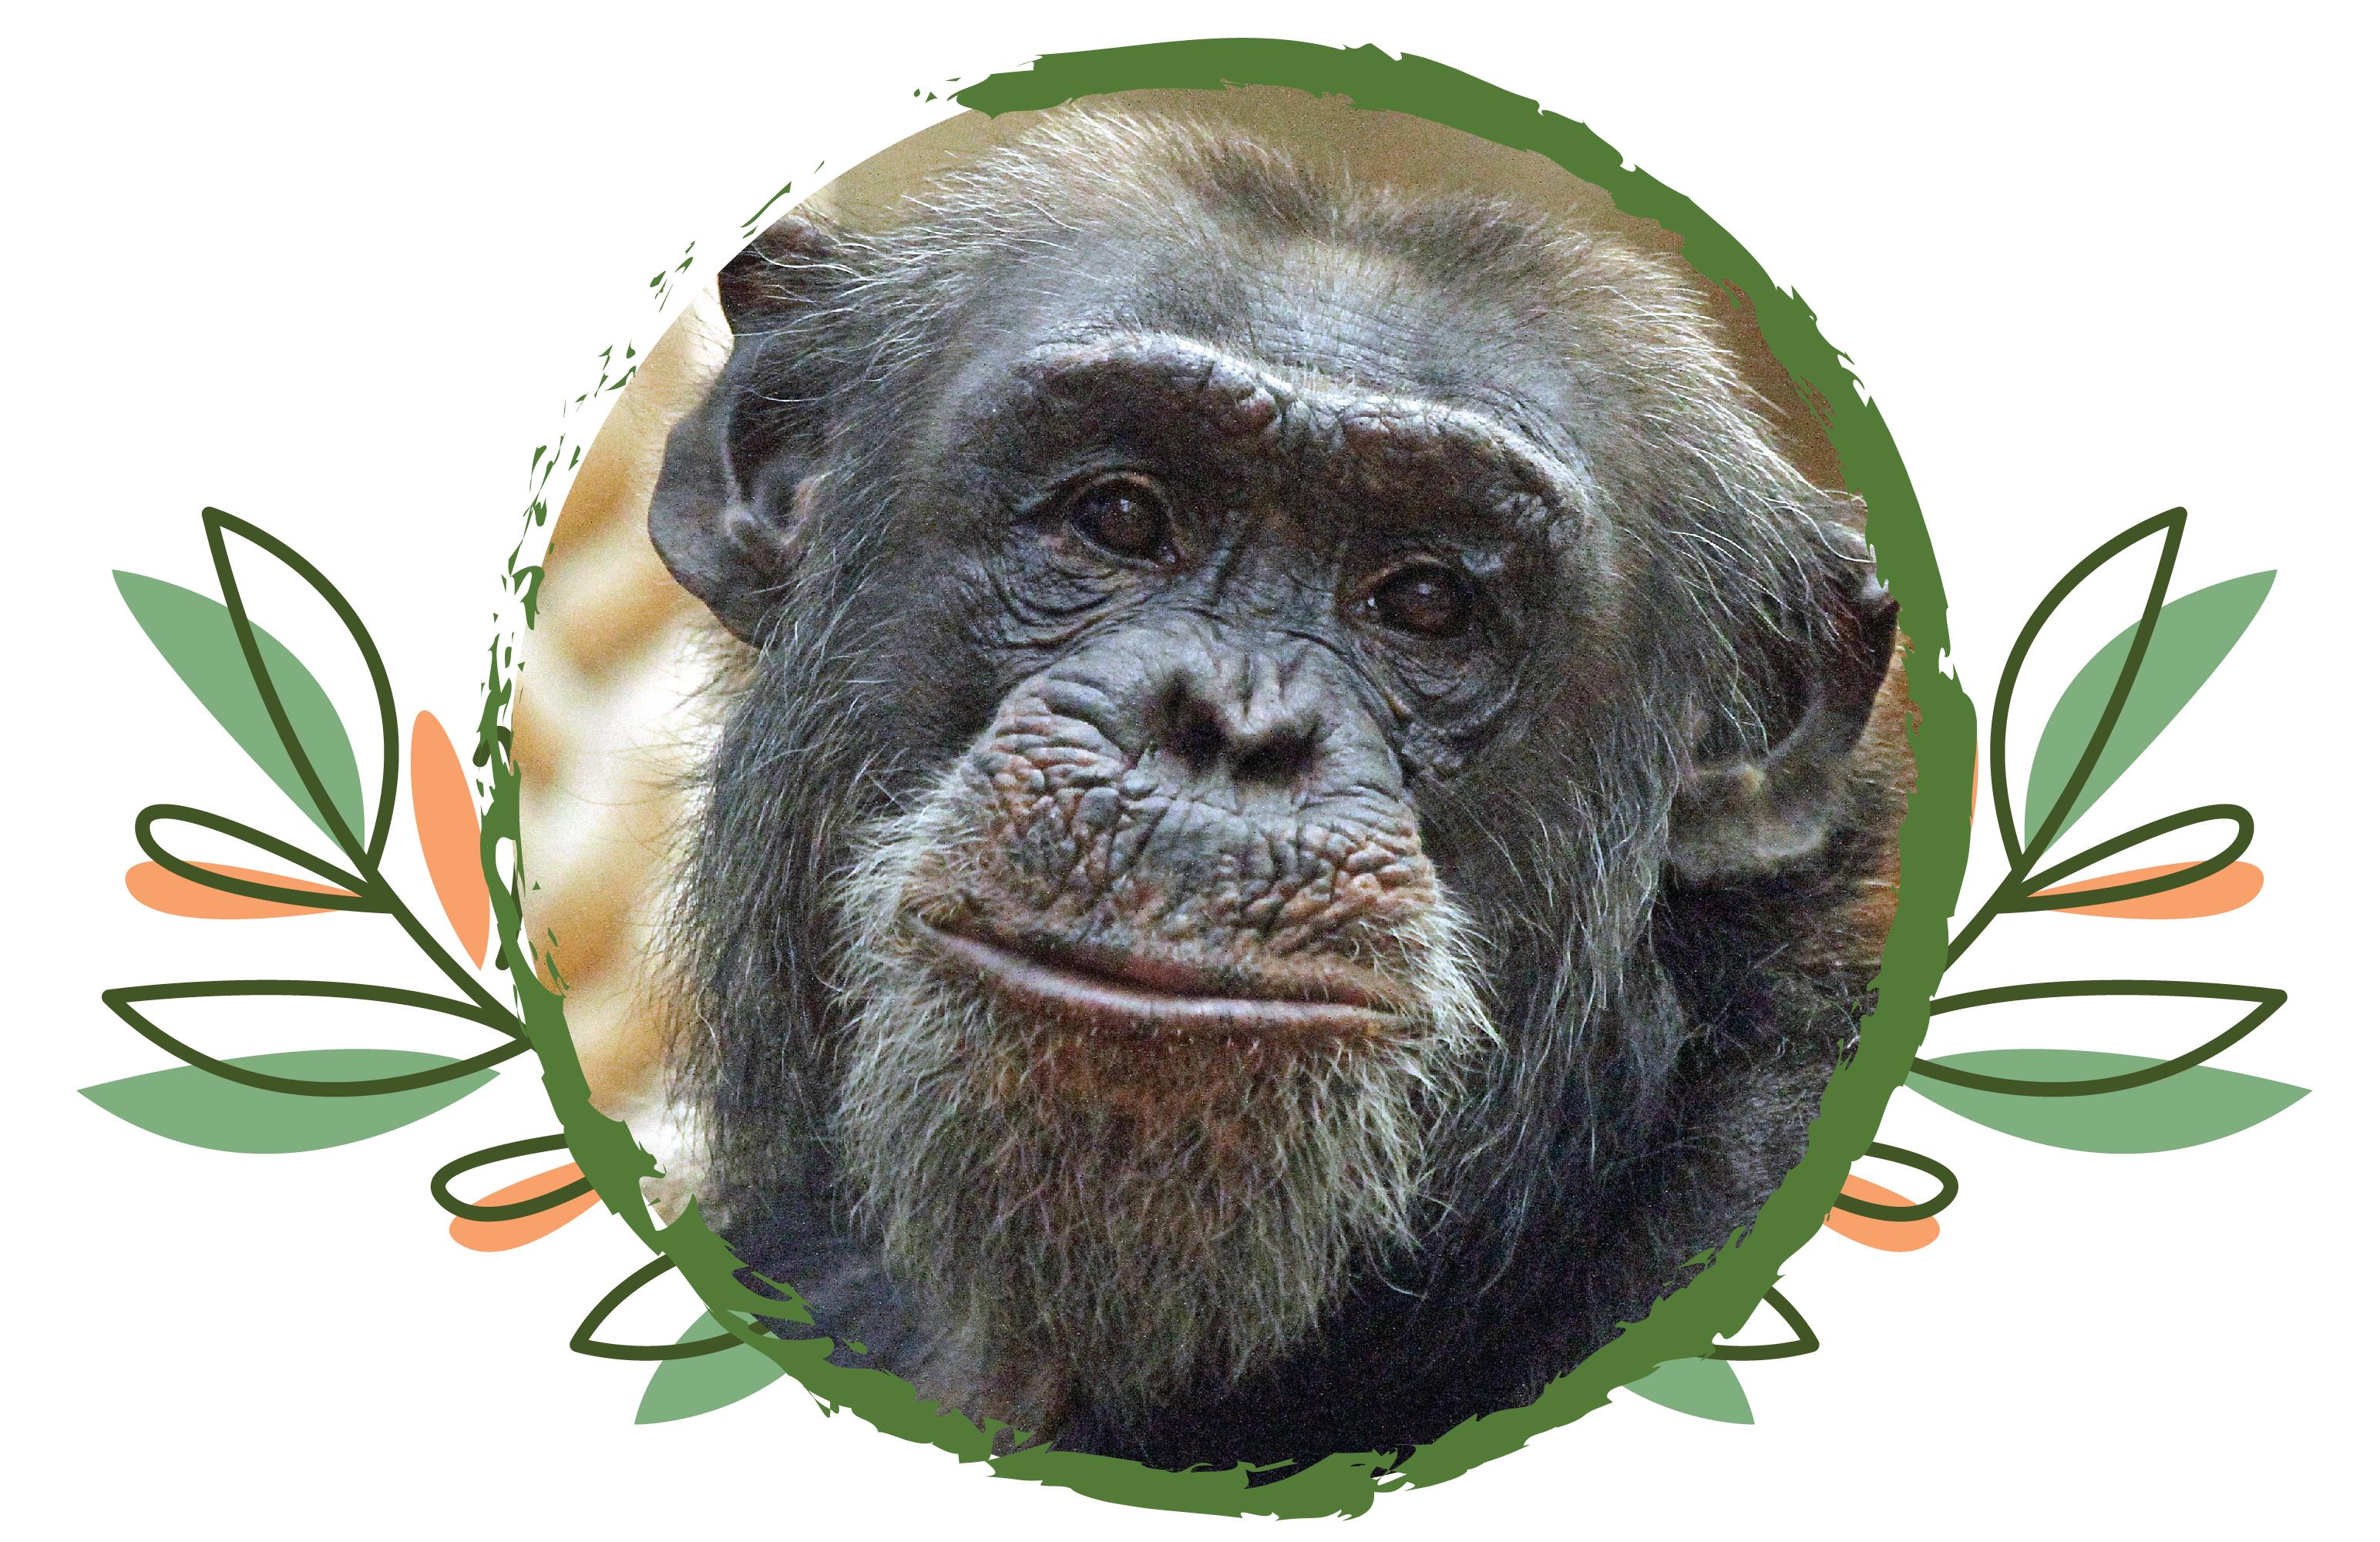 Sad farewell to Pippin the Chimpanzee